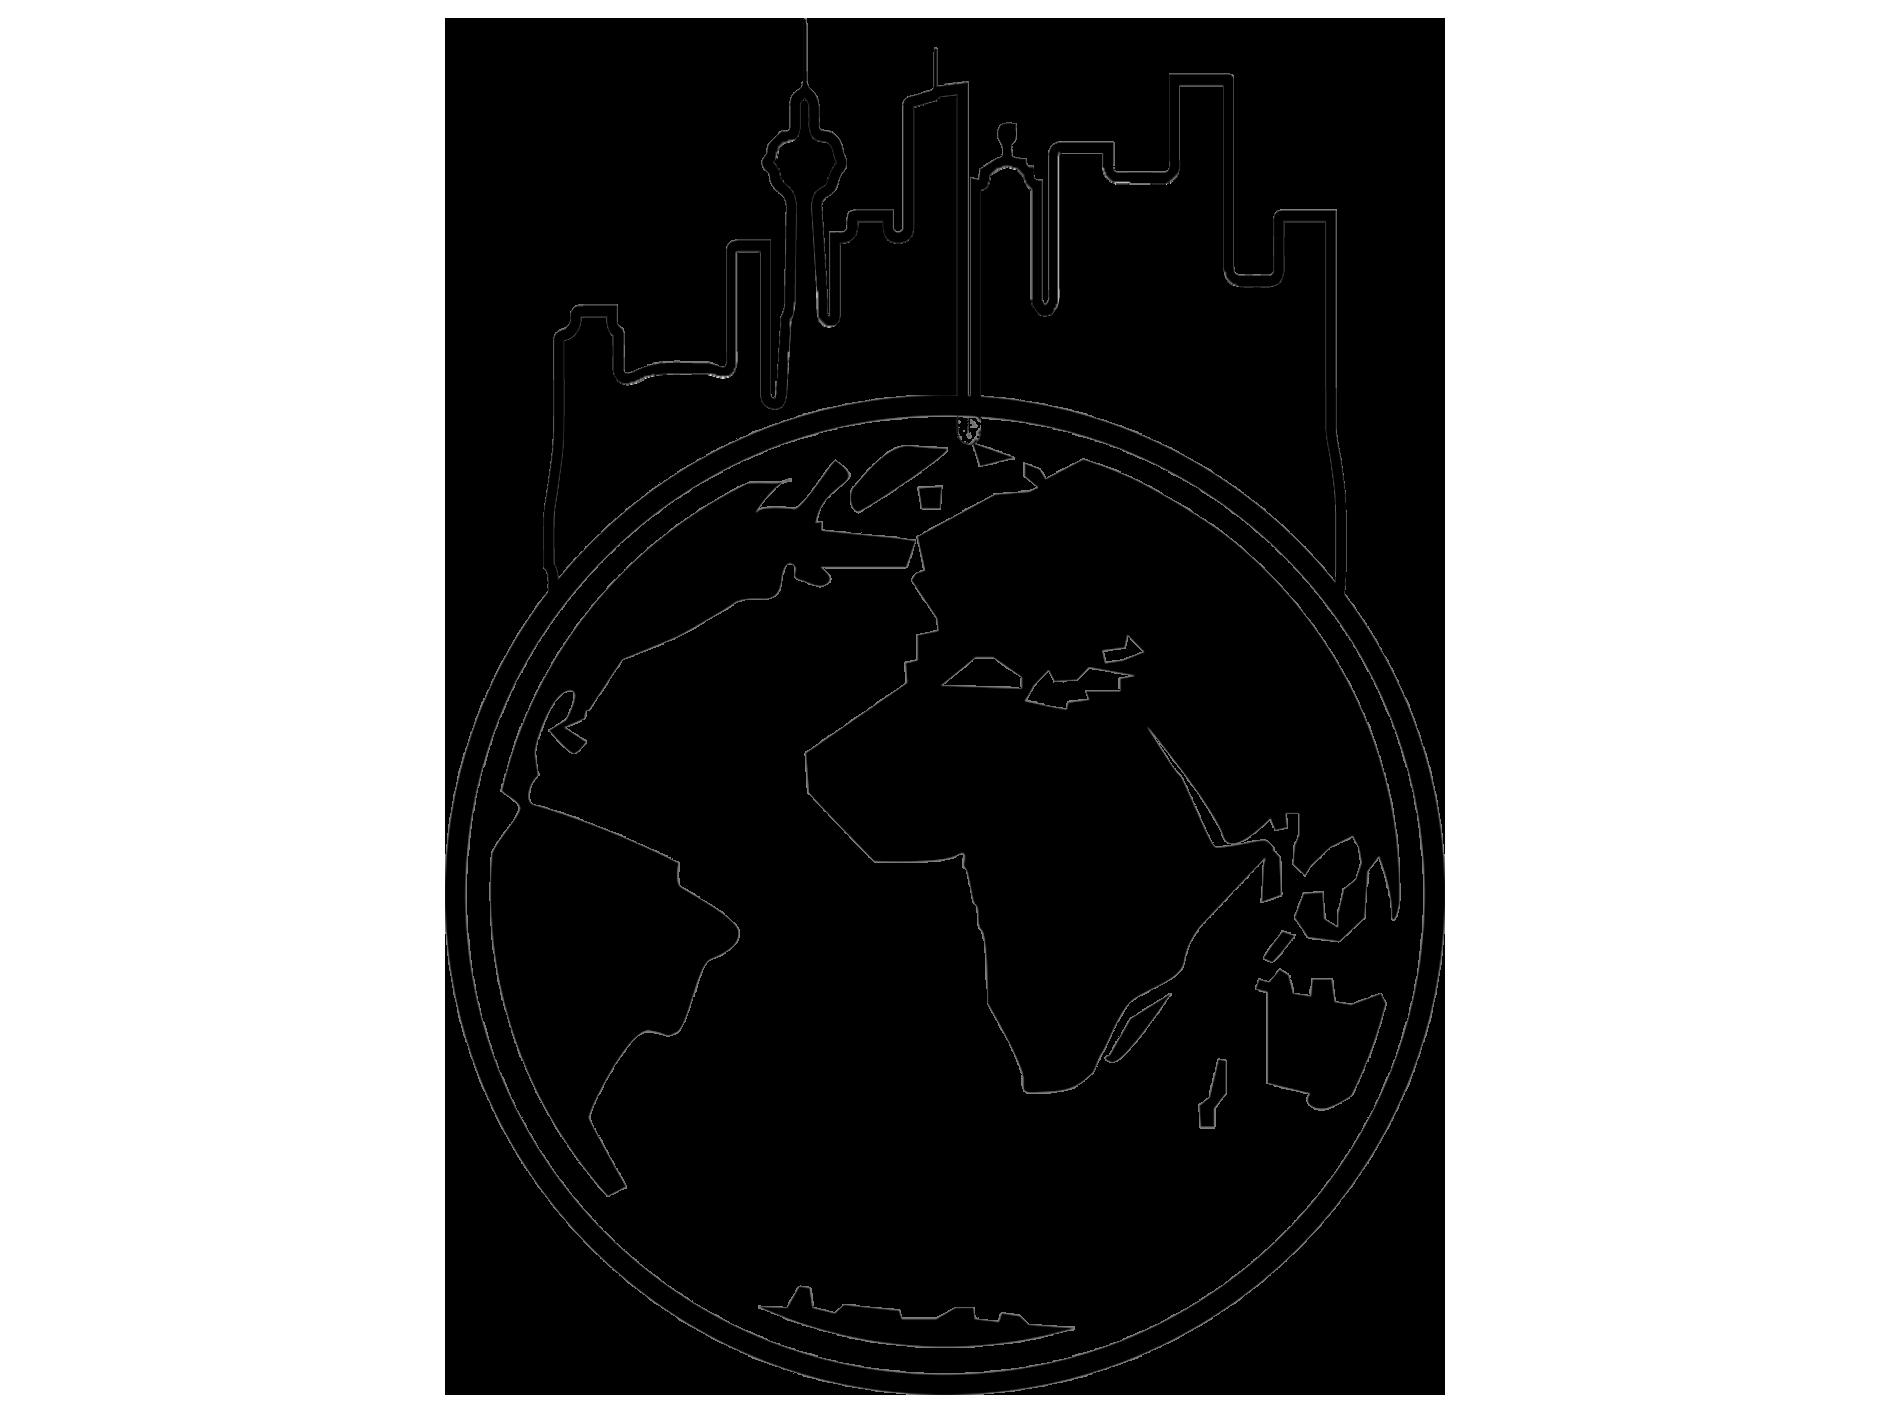 case comp logo transparent black.png